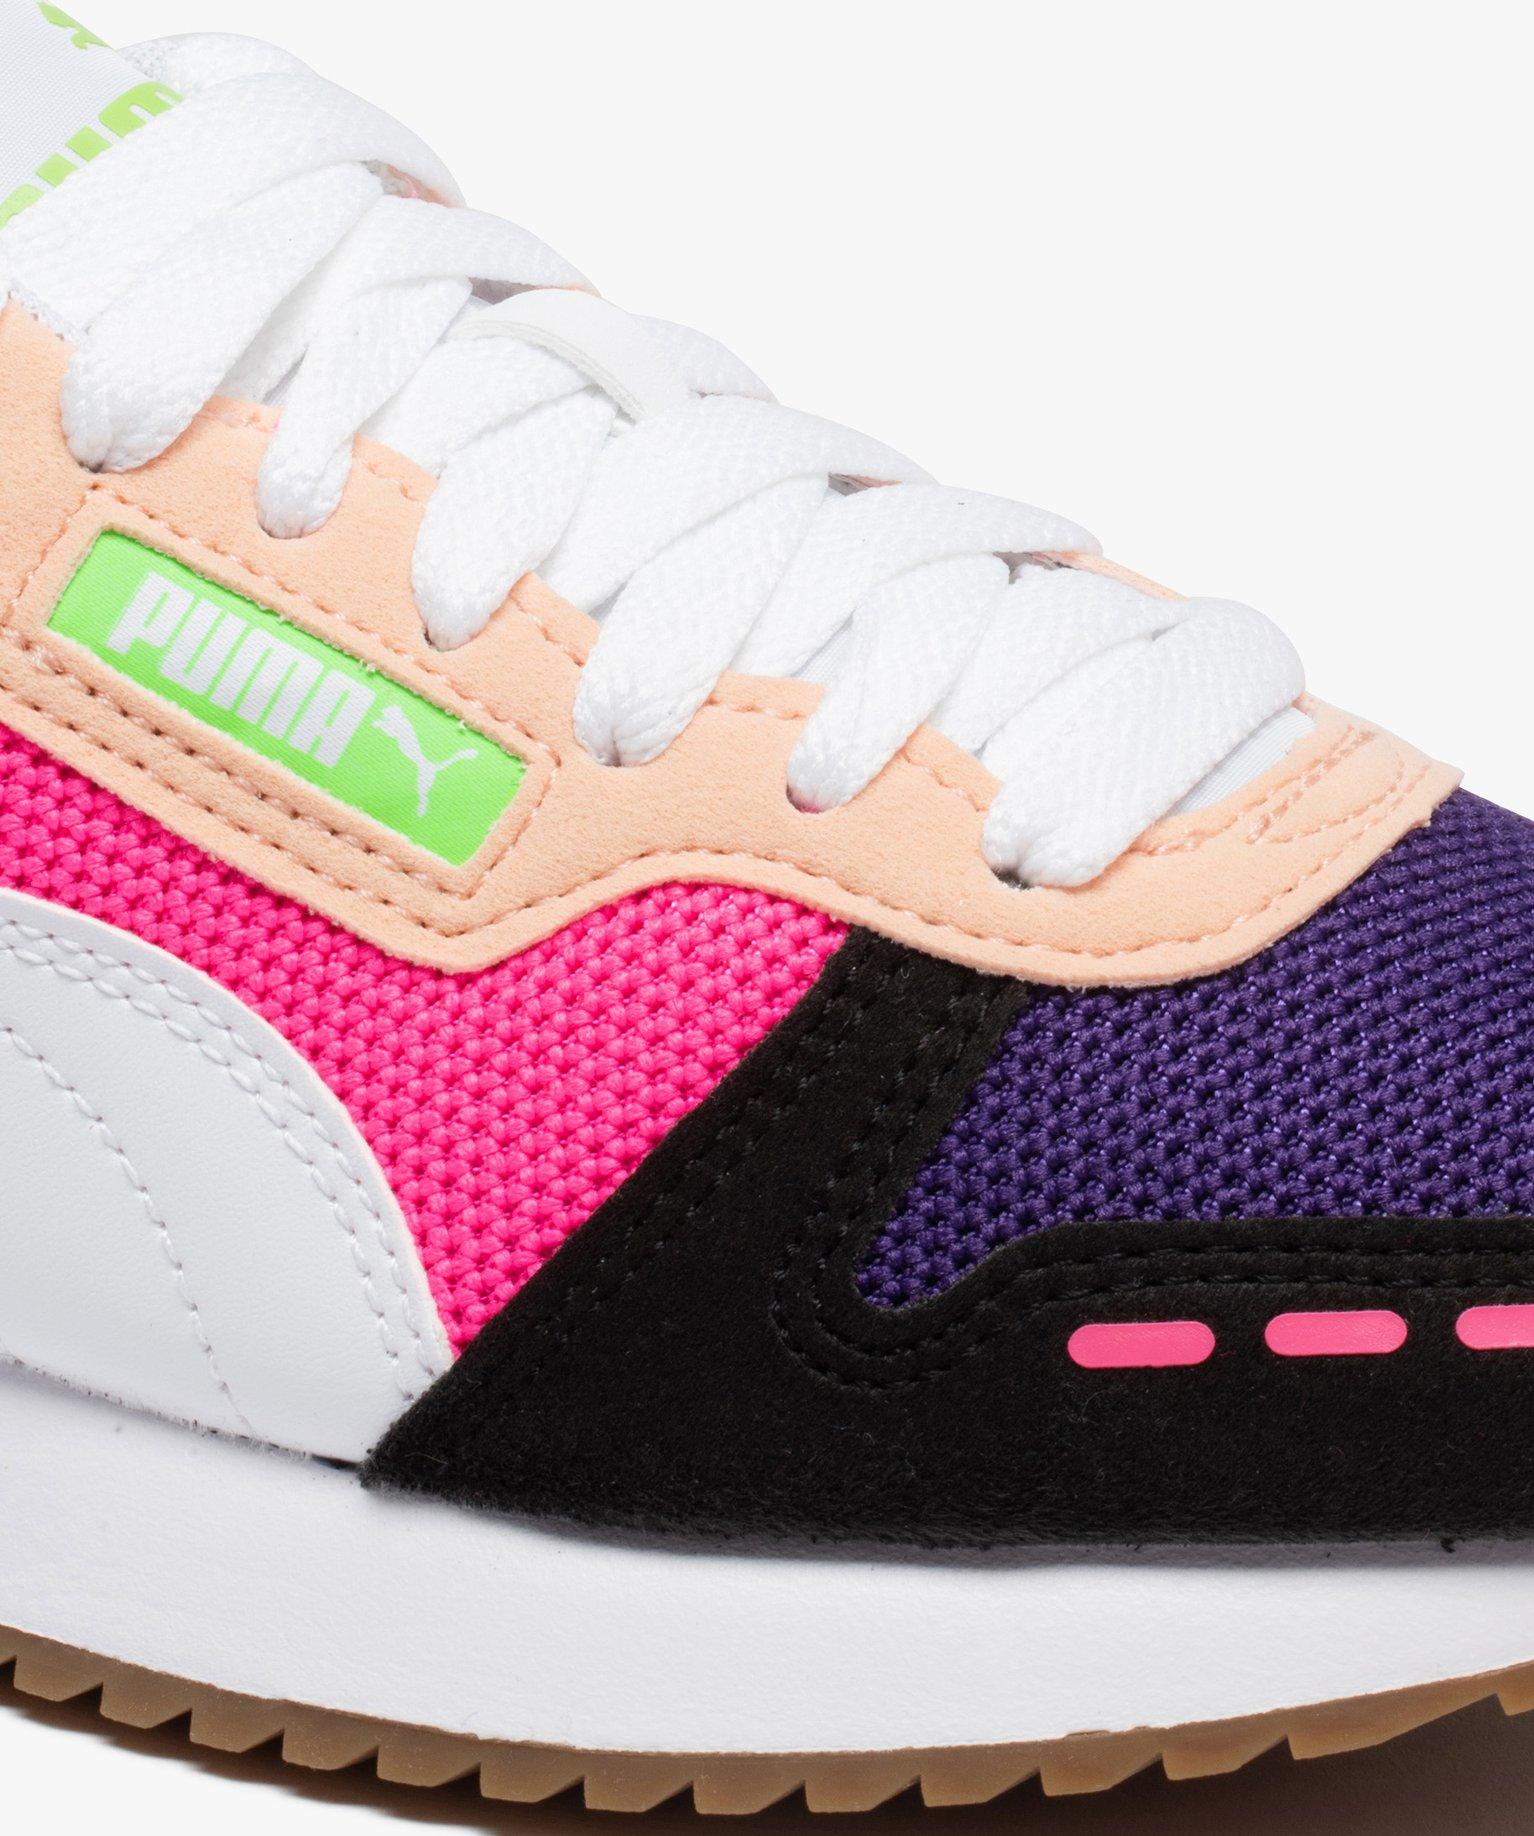 Baskets femme multicolores – Puma R78   GEMO